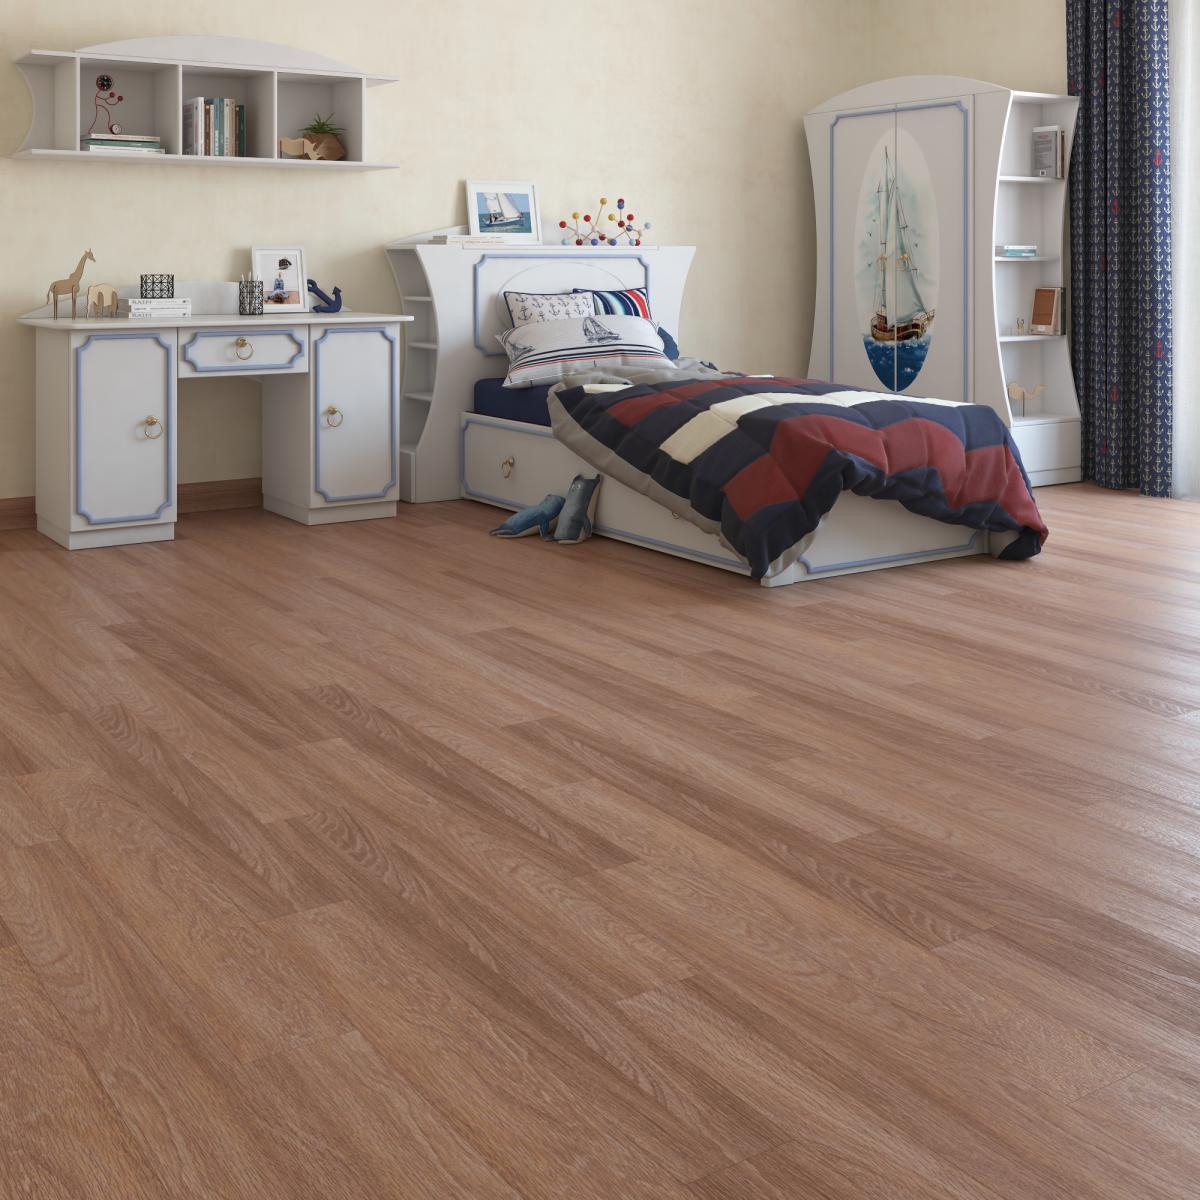 Ламинат Artens Дуб гроссо 32 класс толщина 8 мм 2.131 м²